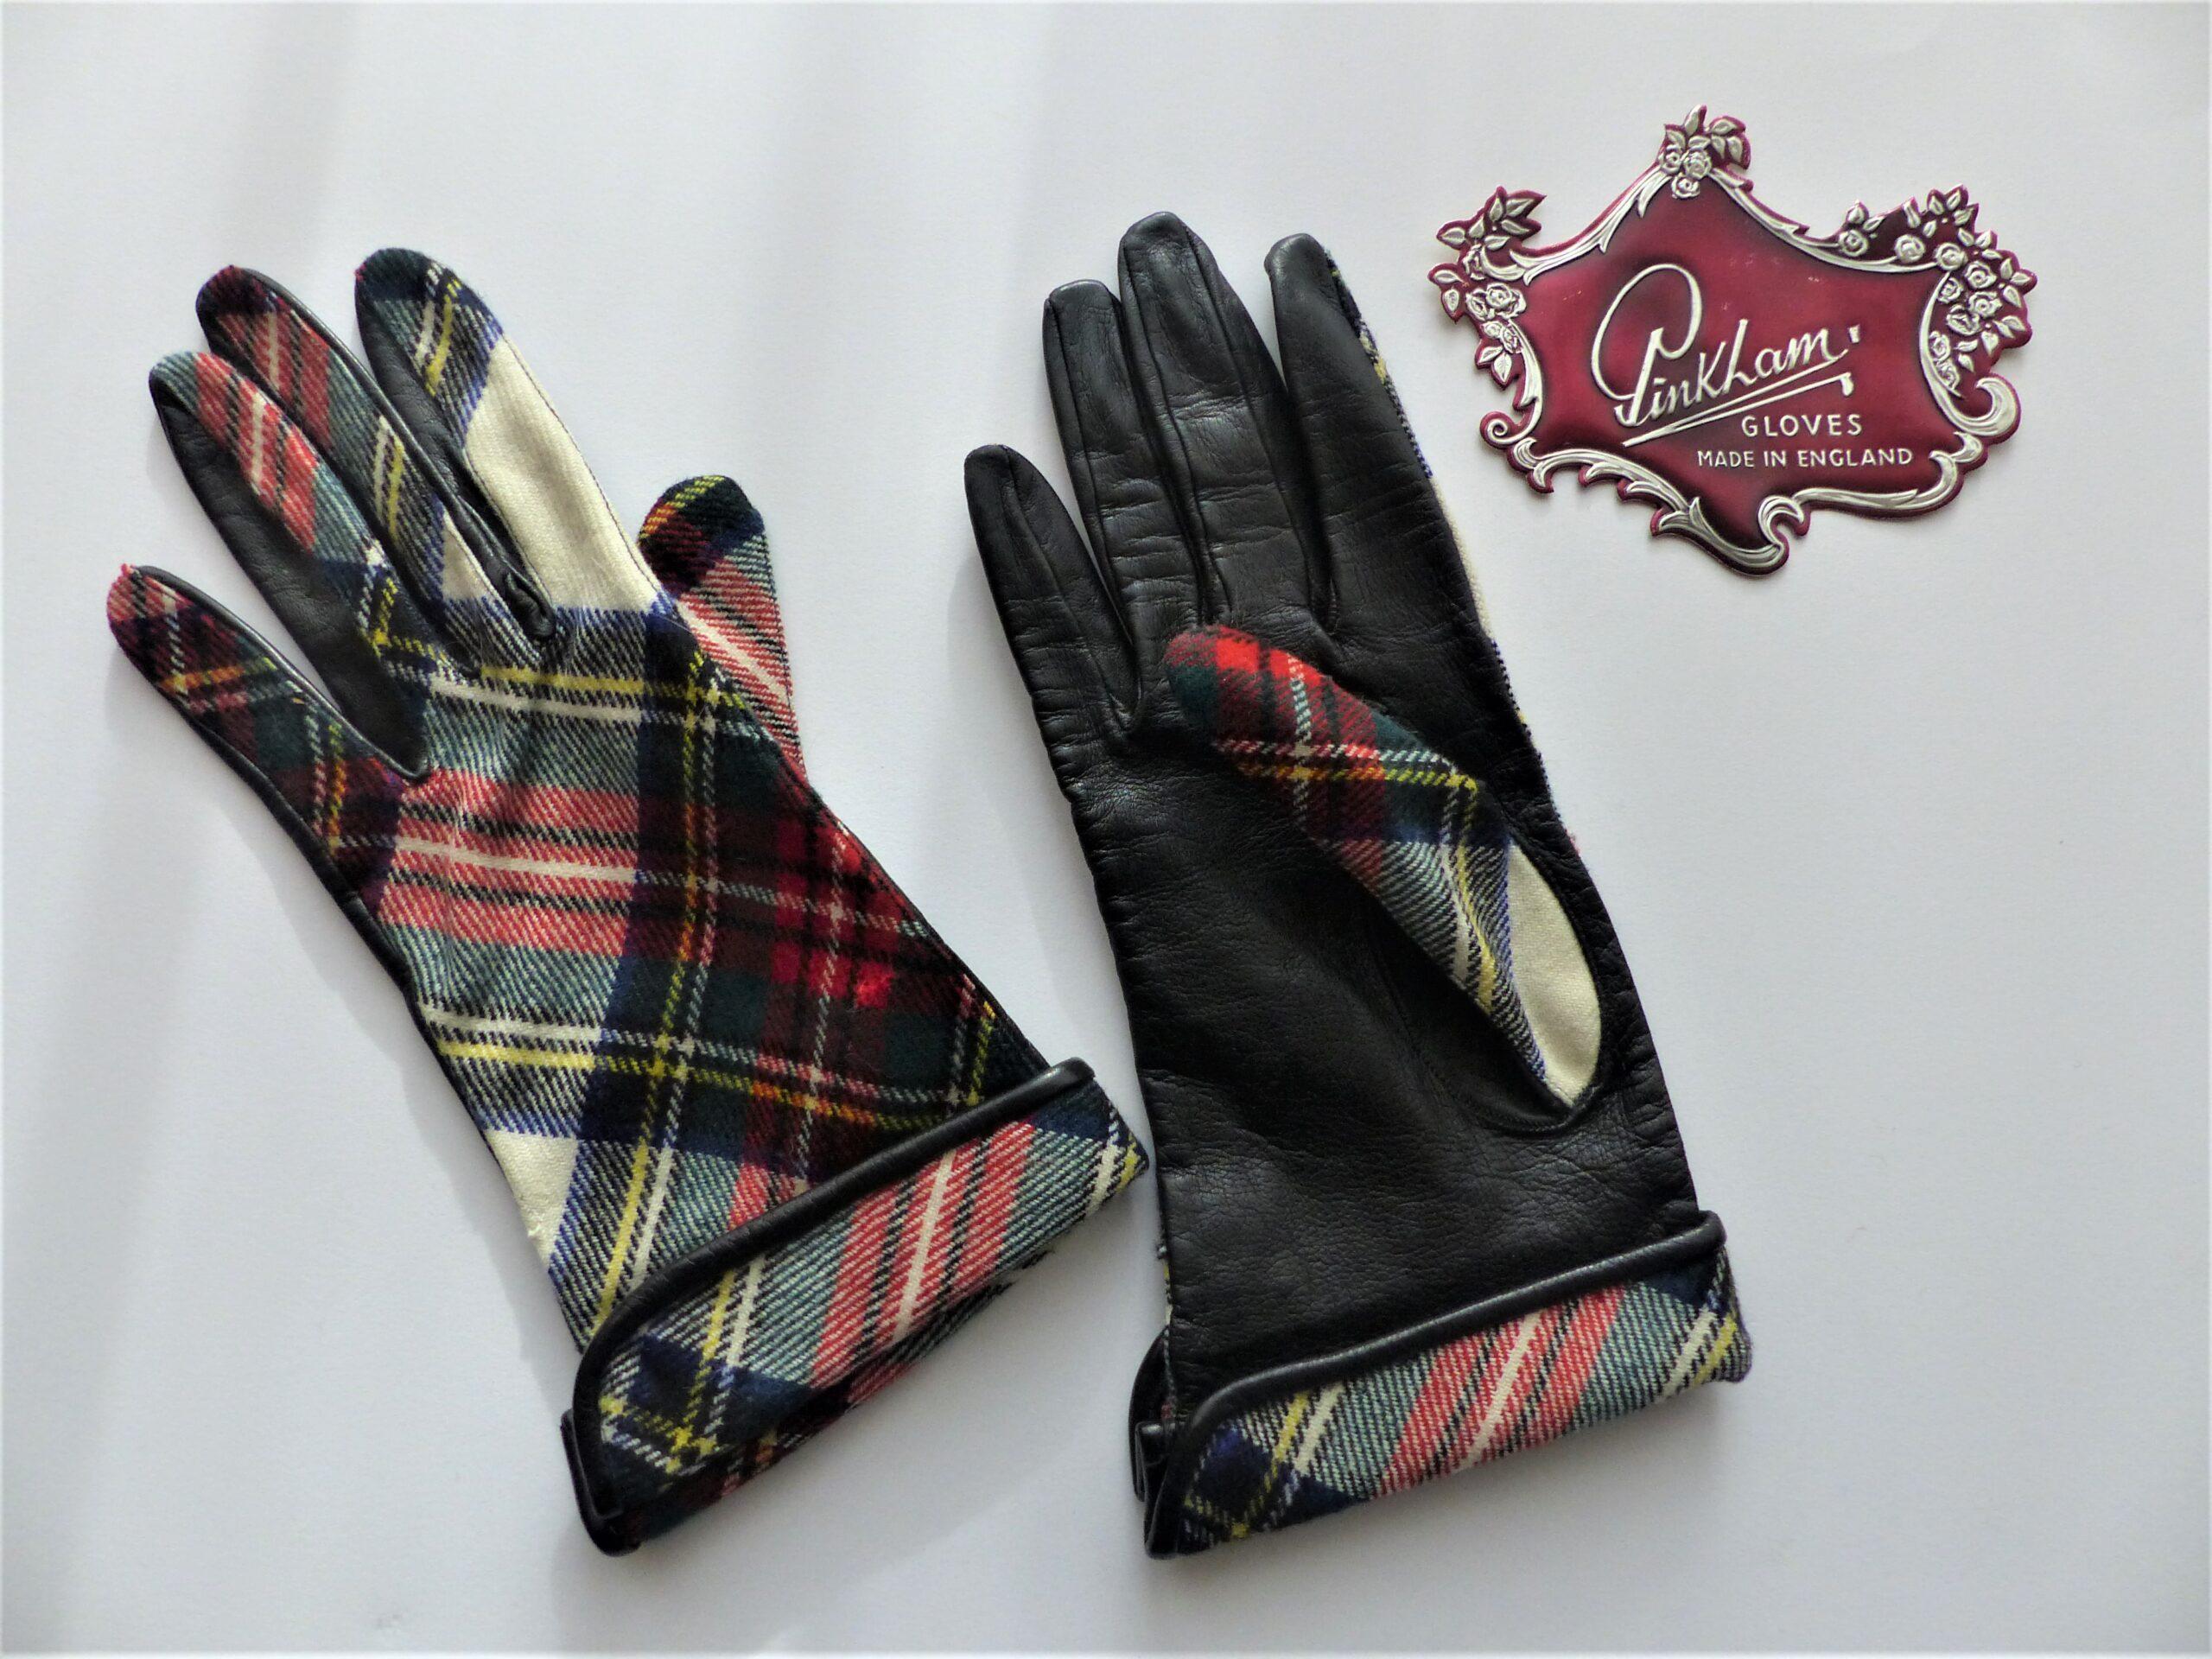 tartan & leather